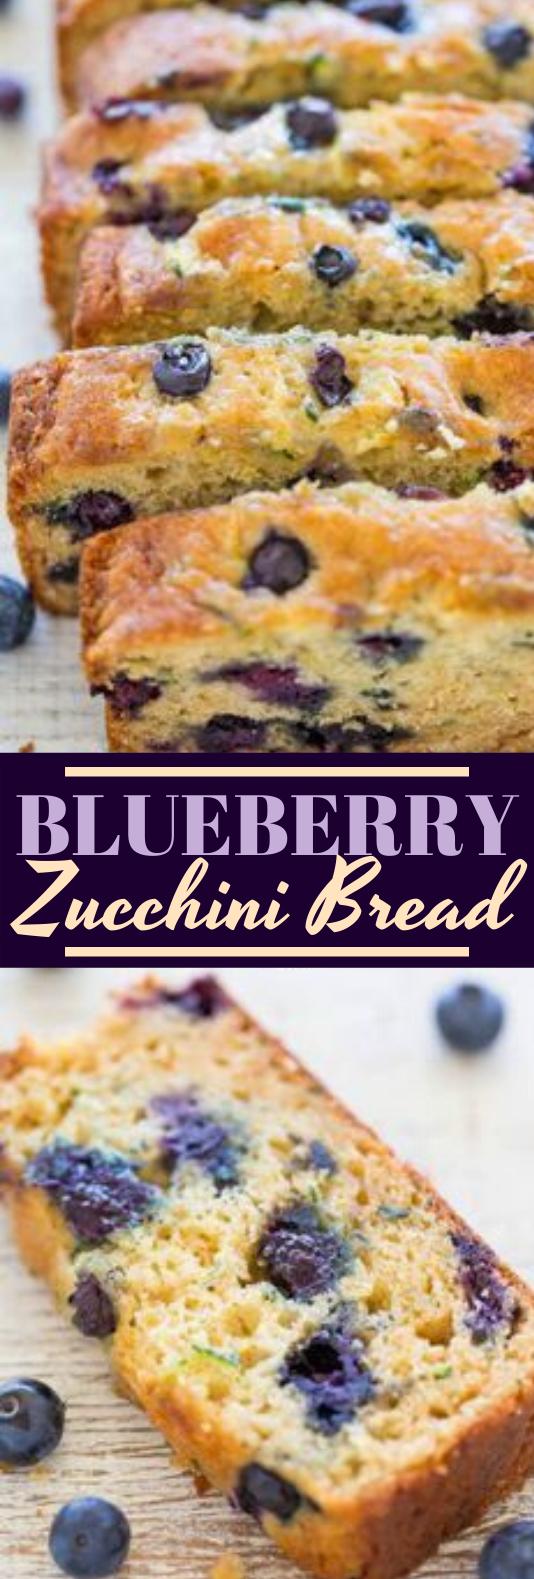 Blueberry Zucchini Bread #healthy #breakfast #bread #paleo #recipe